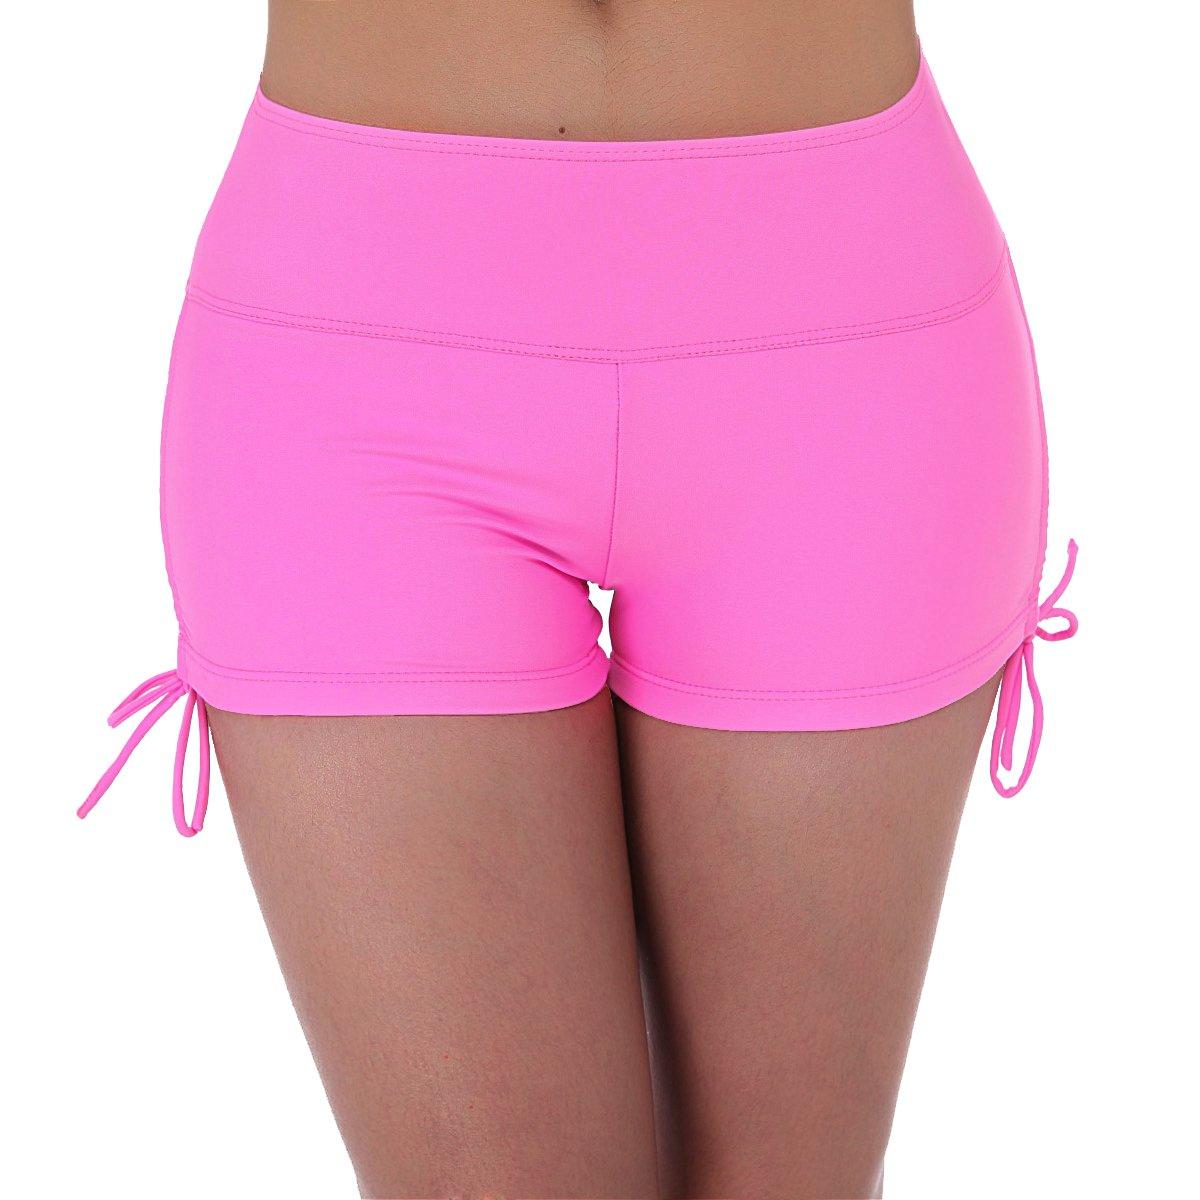 UNOW Women's Sporty Adjustable Boy Leg Wide Waistband Fully Lined Bikini Bottom Beach Briefs Tankinis Board Shorts(Pink,S)